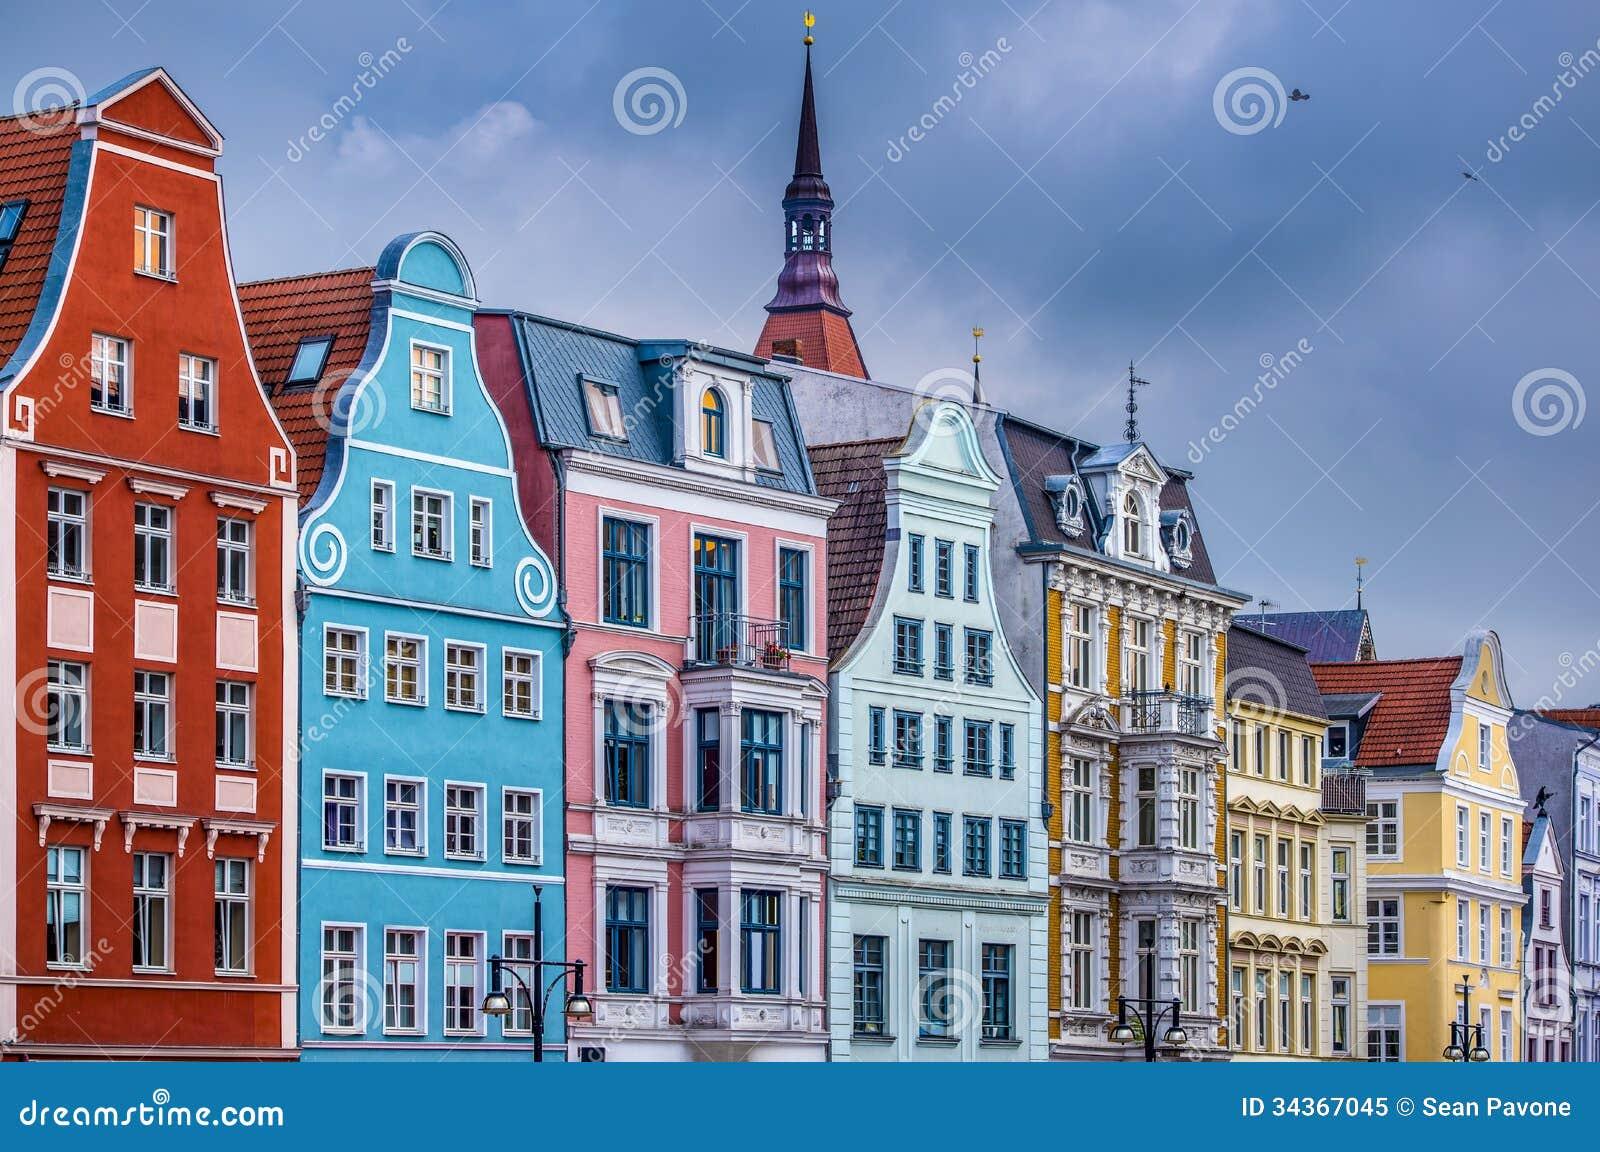 horhus i tyskland fri grafi